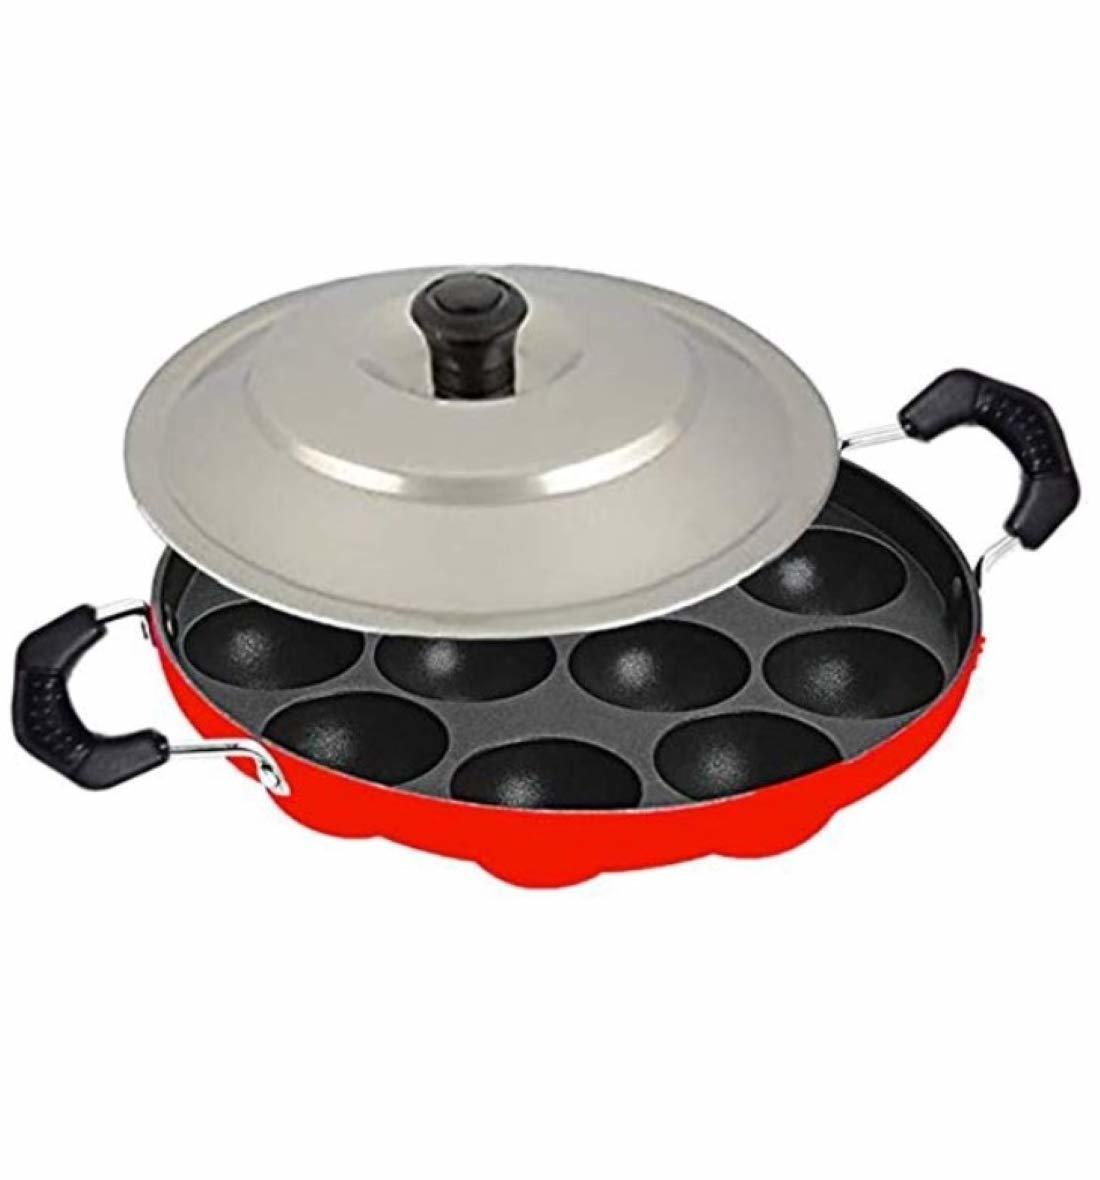 Appam Cookware